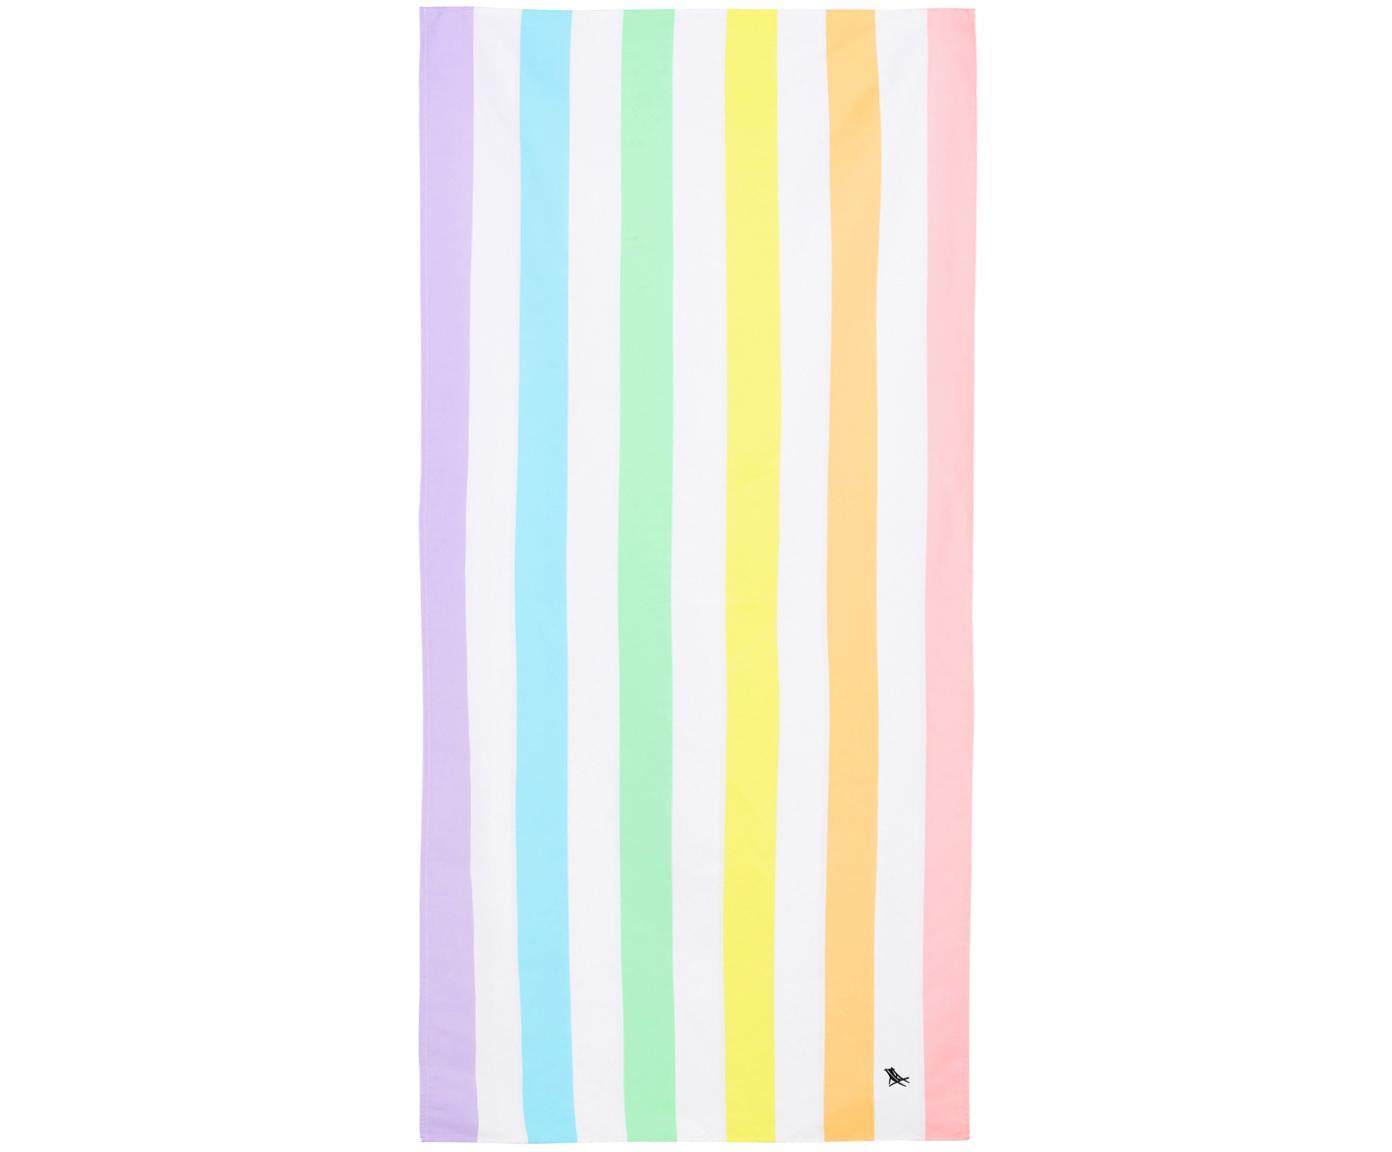 Microvezel strandlaken Summer, sneldrogend, Microvezels (80% polyester, 20% polyamide), Multicolour, wit, 90 x 200 cm